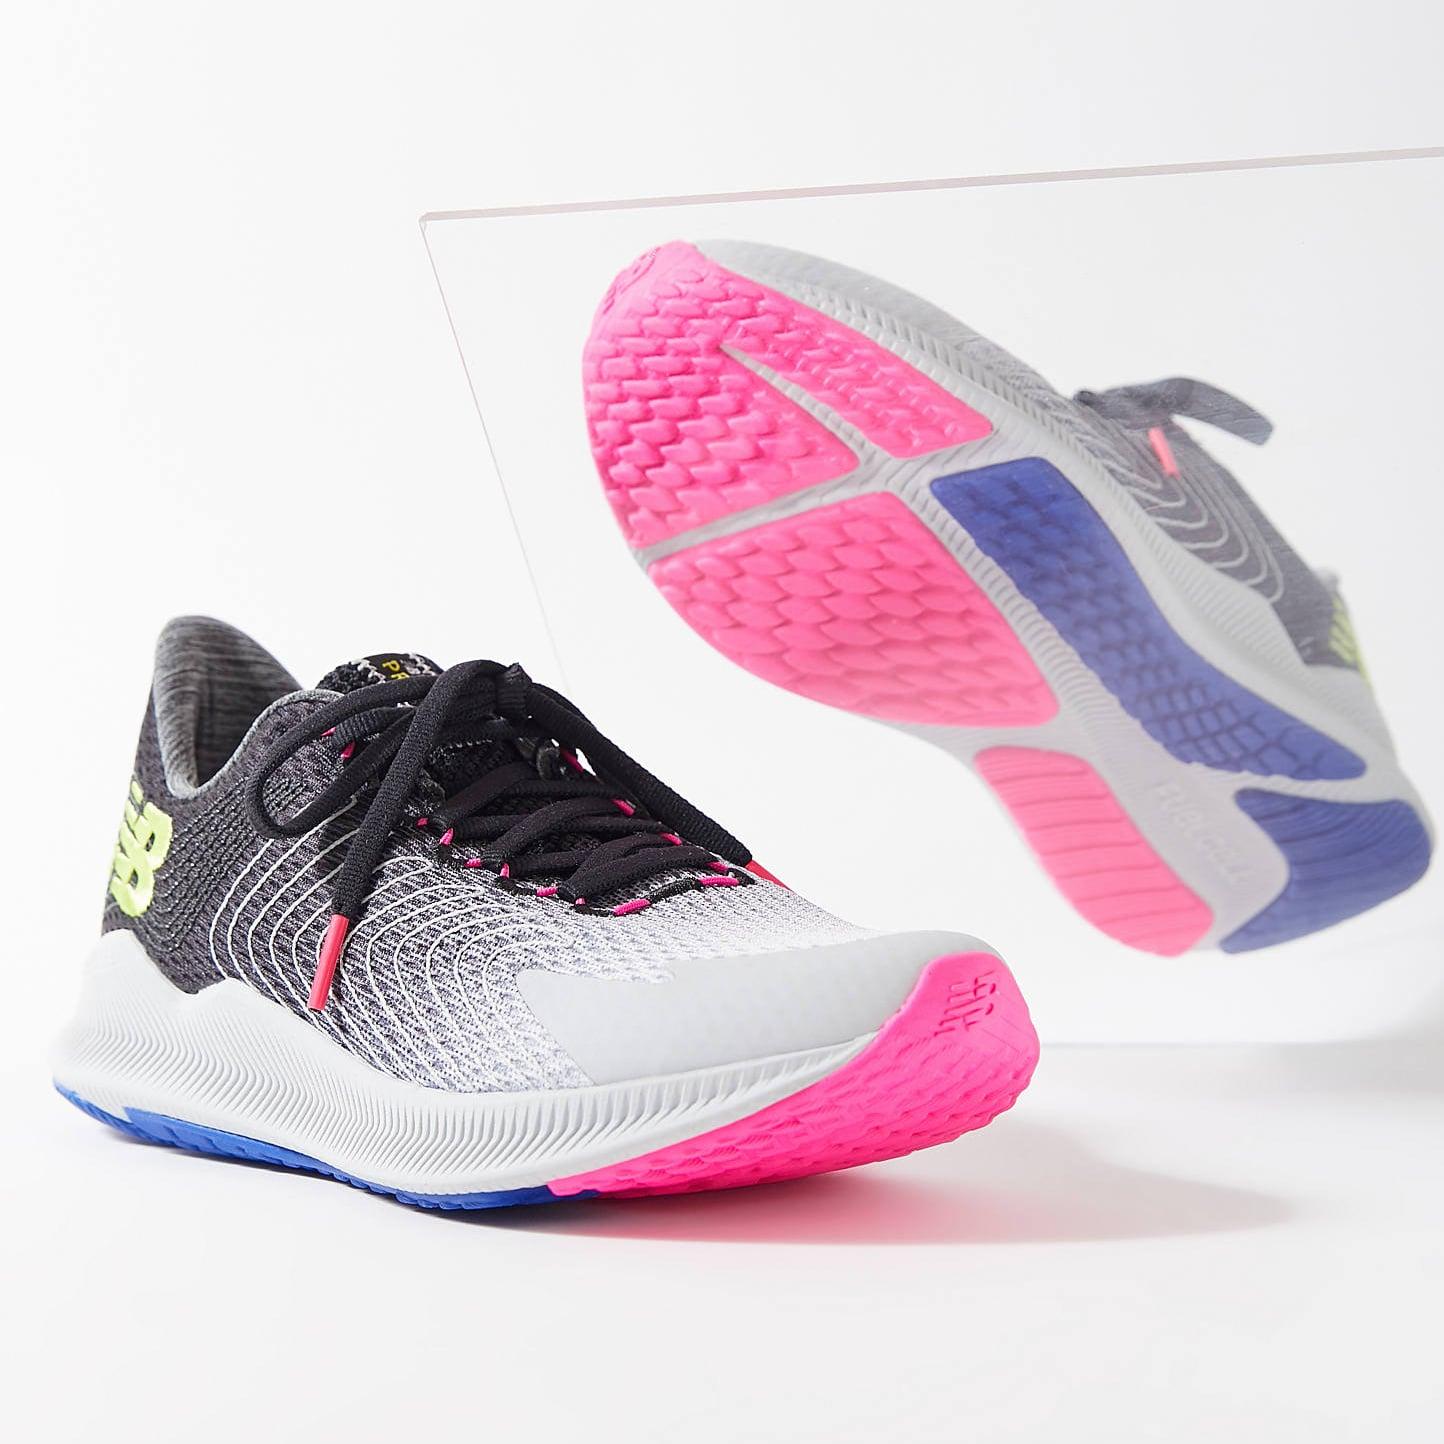 Best Sneakers For Women | POPSUGAR Fitness Australia